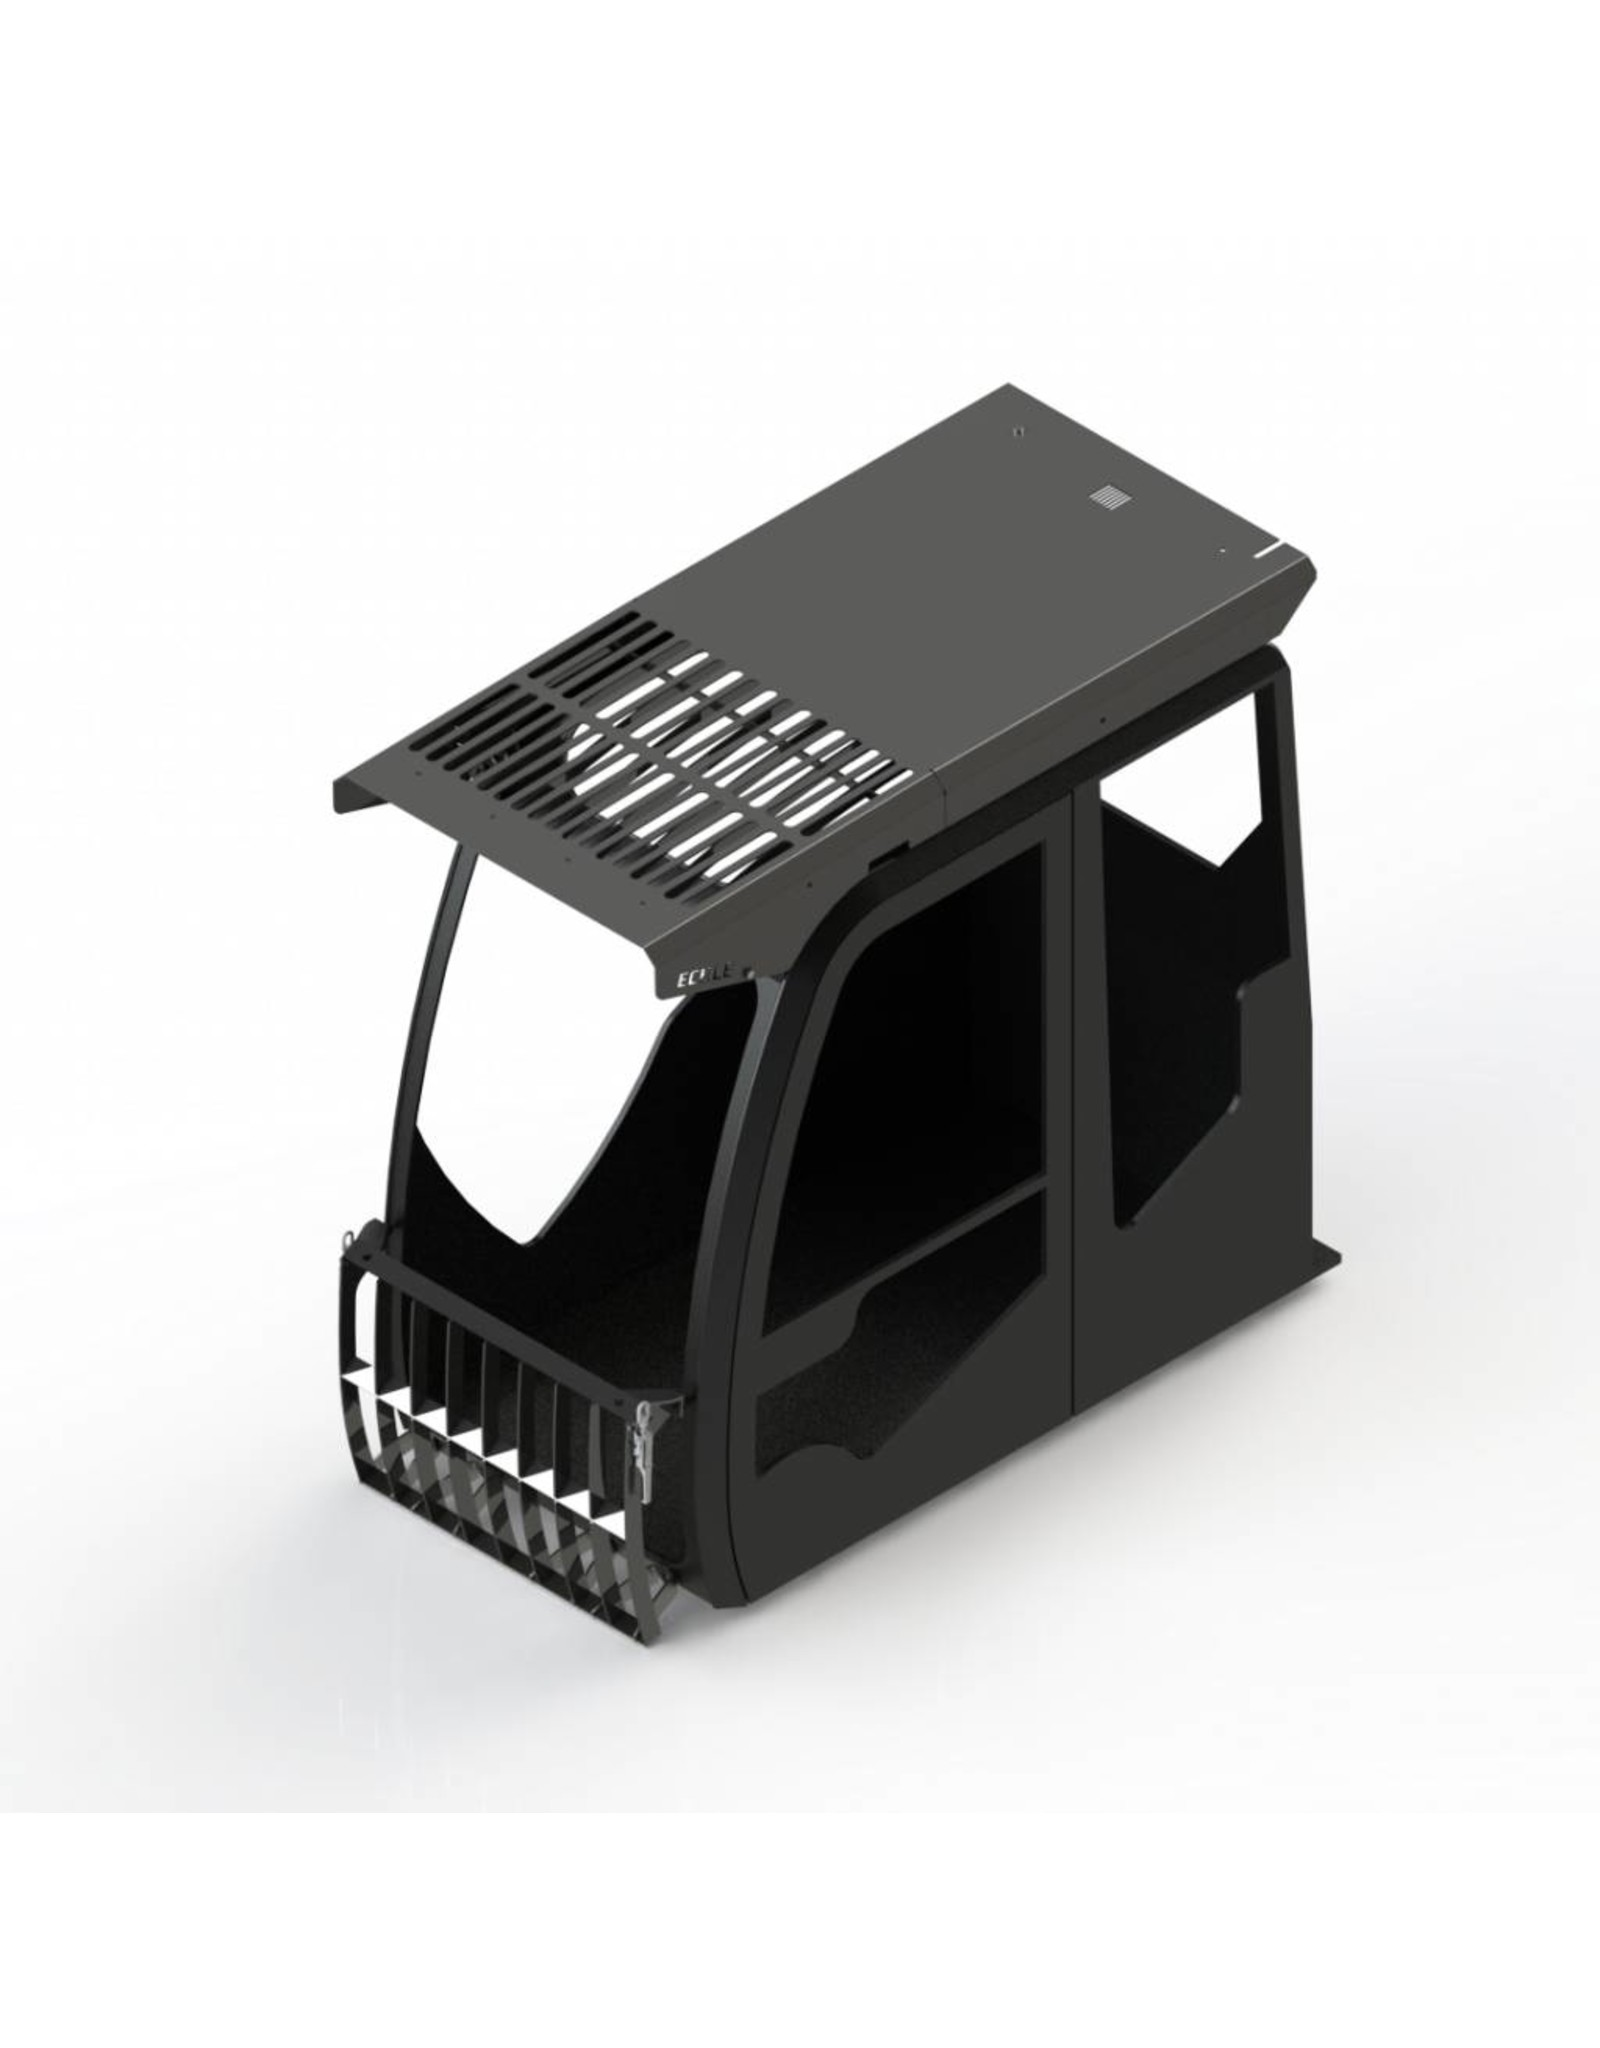 Echle Hartstahl GmbH FOPS für Doosan DX380LC-5